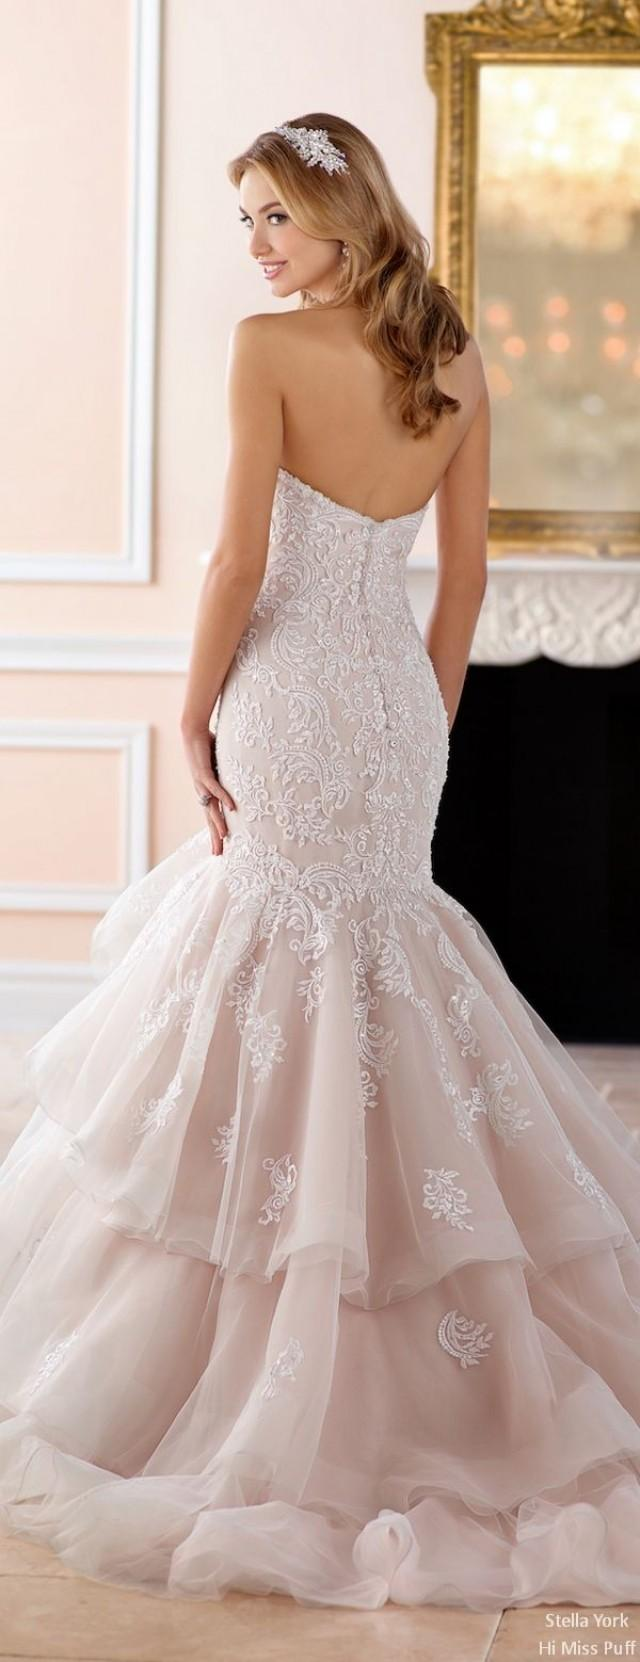 14fc097b153 Dress - Stella York Wedding Dresses 2017  2716976 - Weddbook